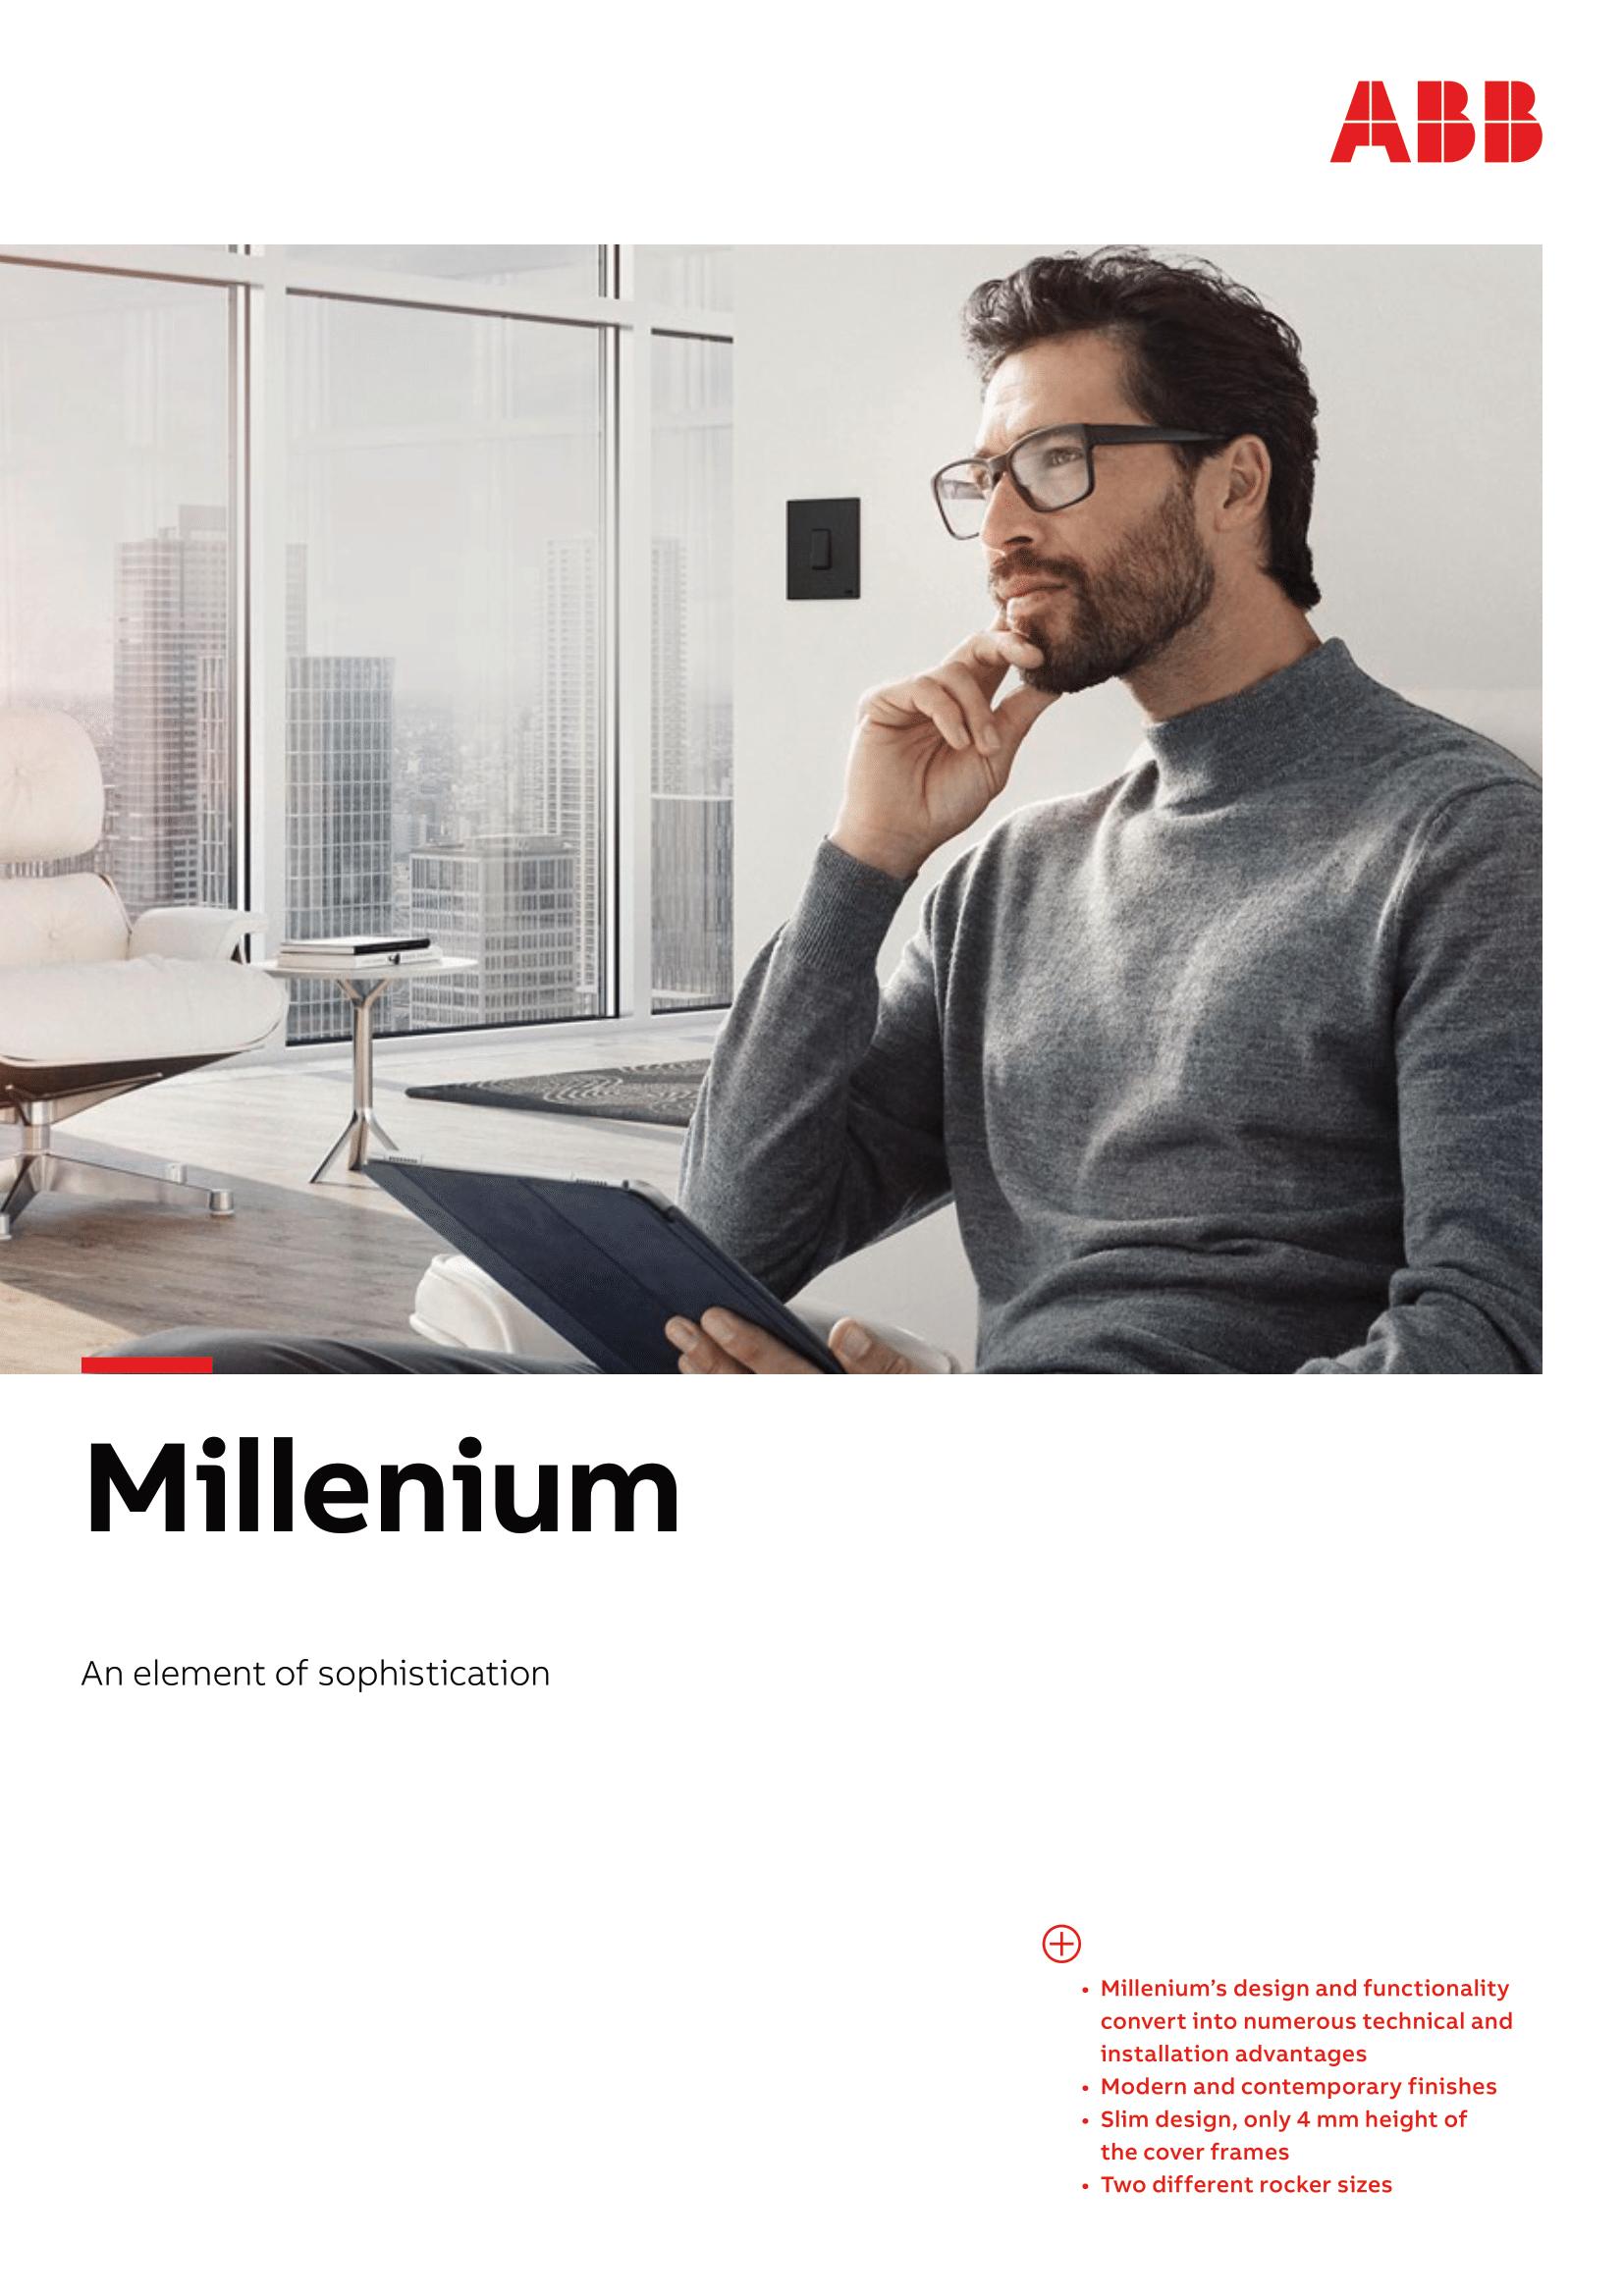 ABB Millenium Catalogue